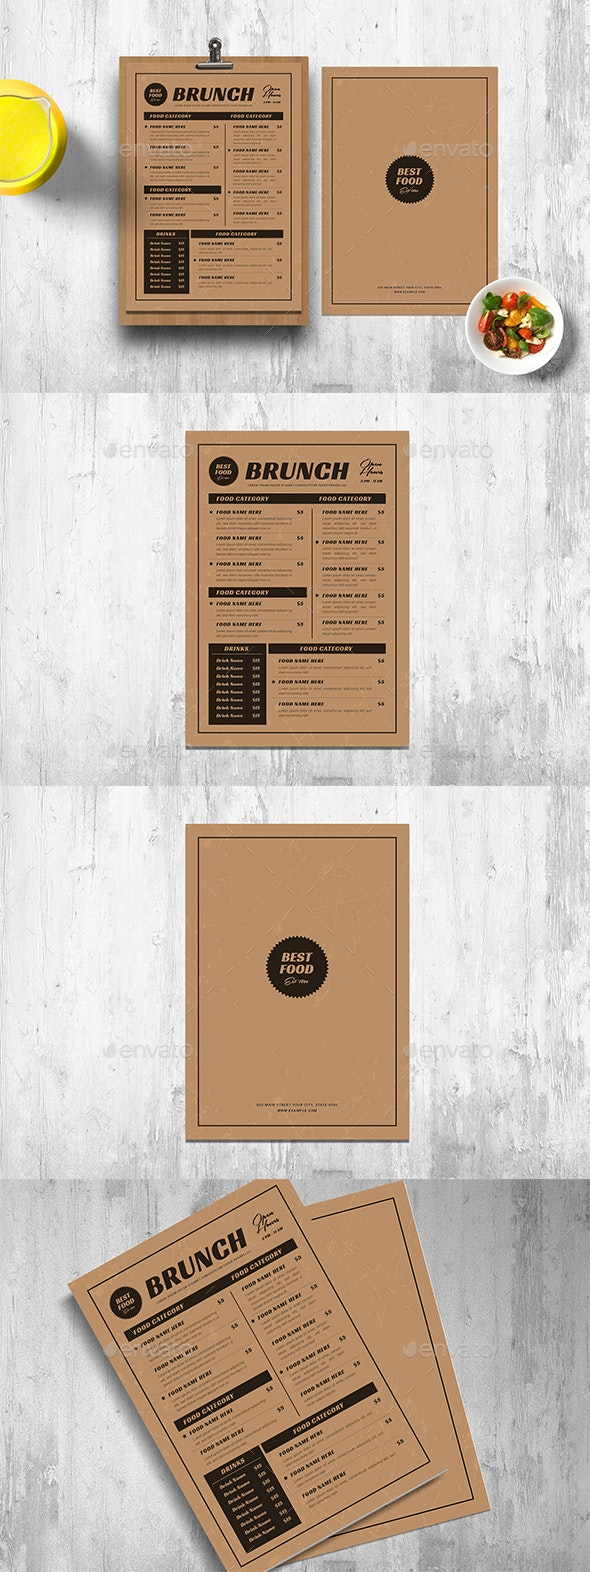 Retro Menus With Kraft Paper - Restaurant Flyers